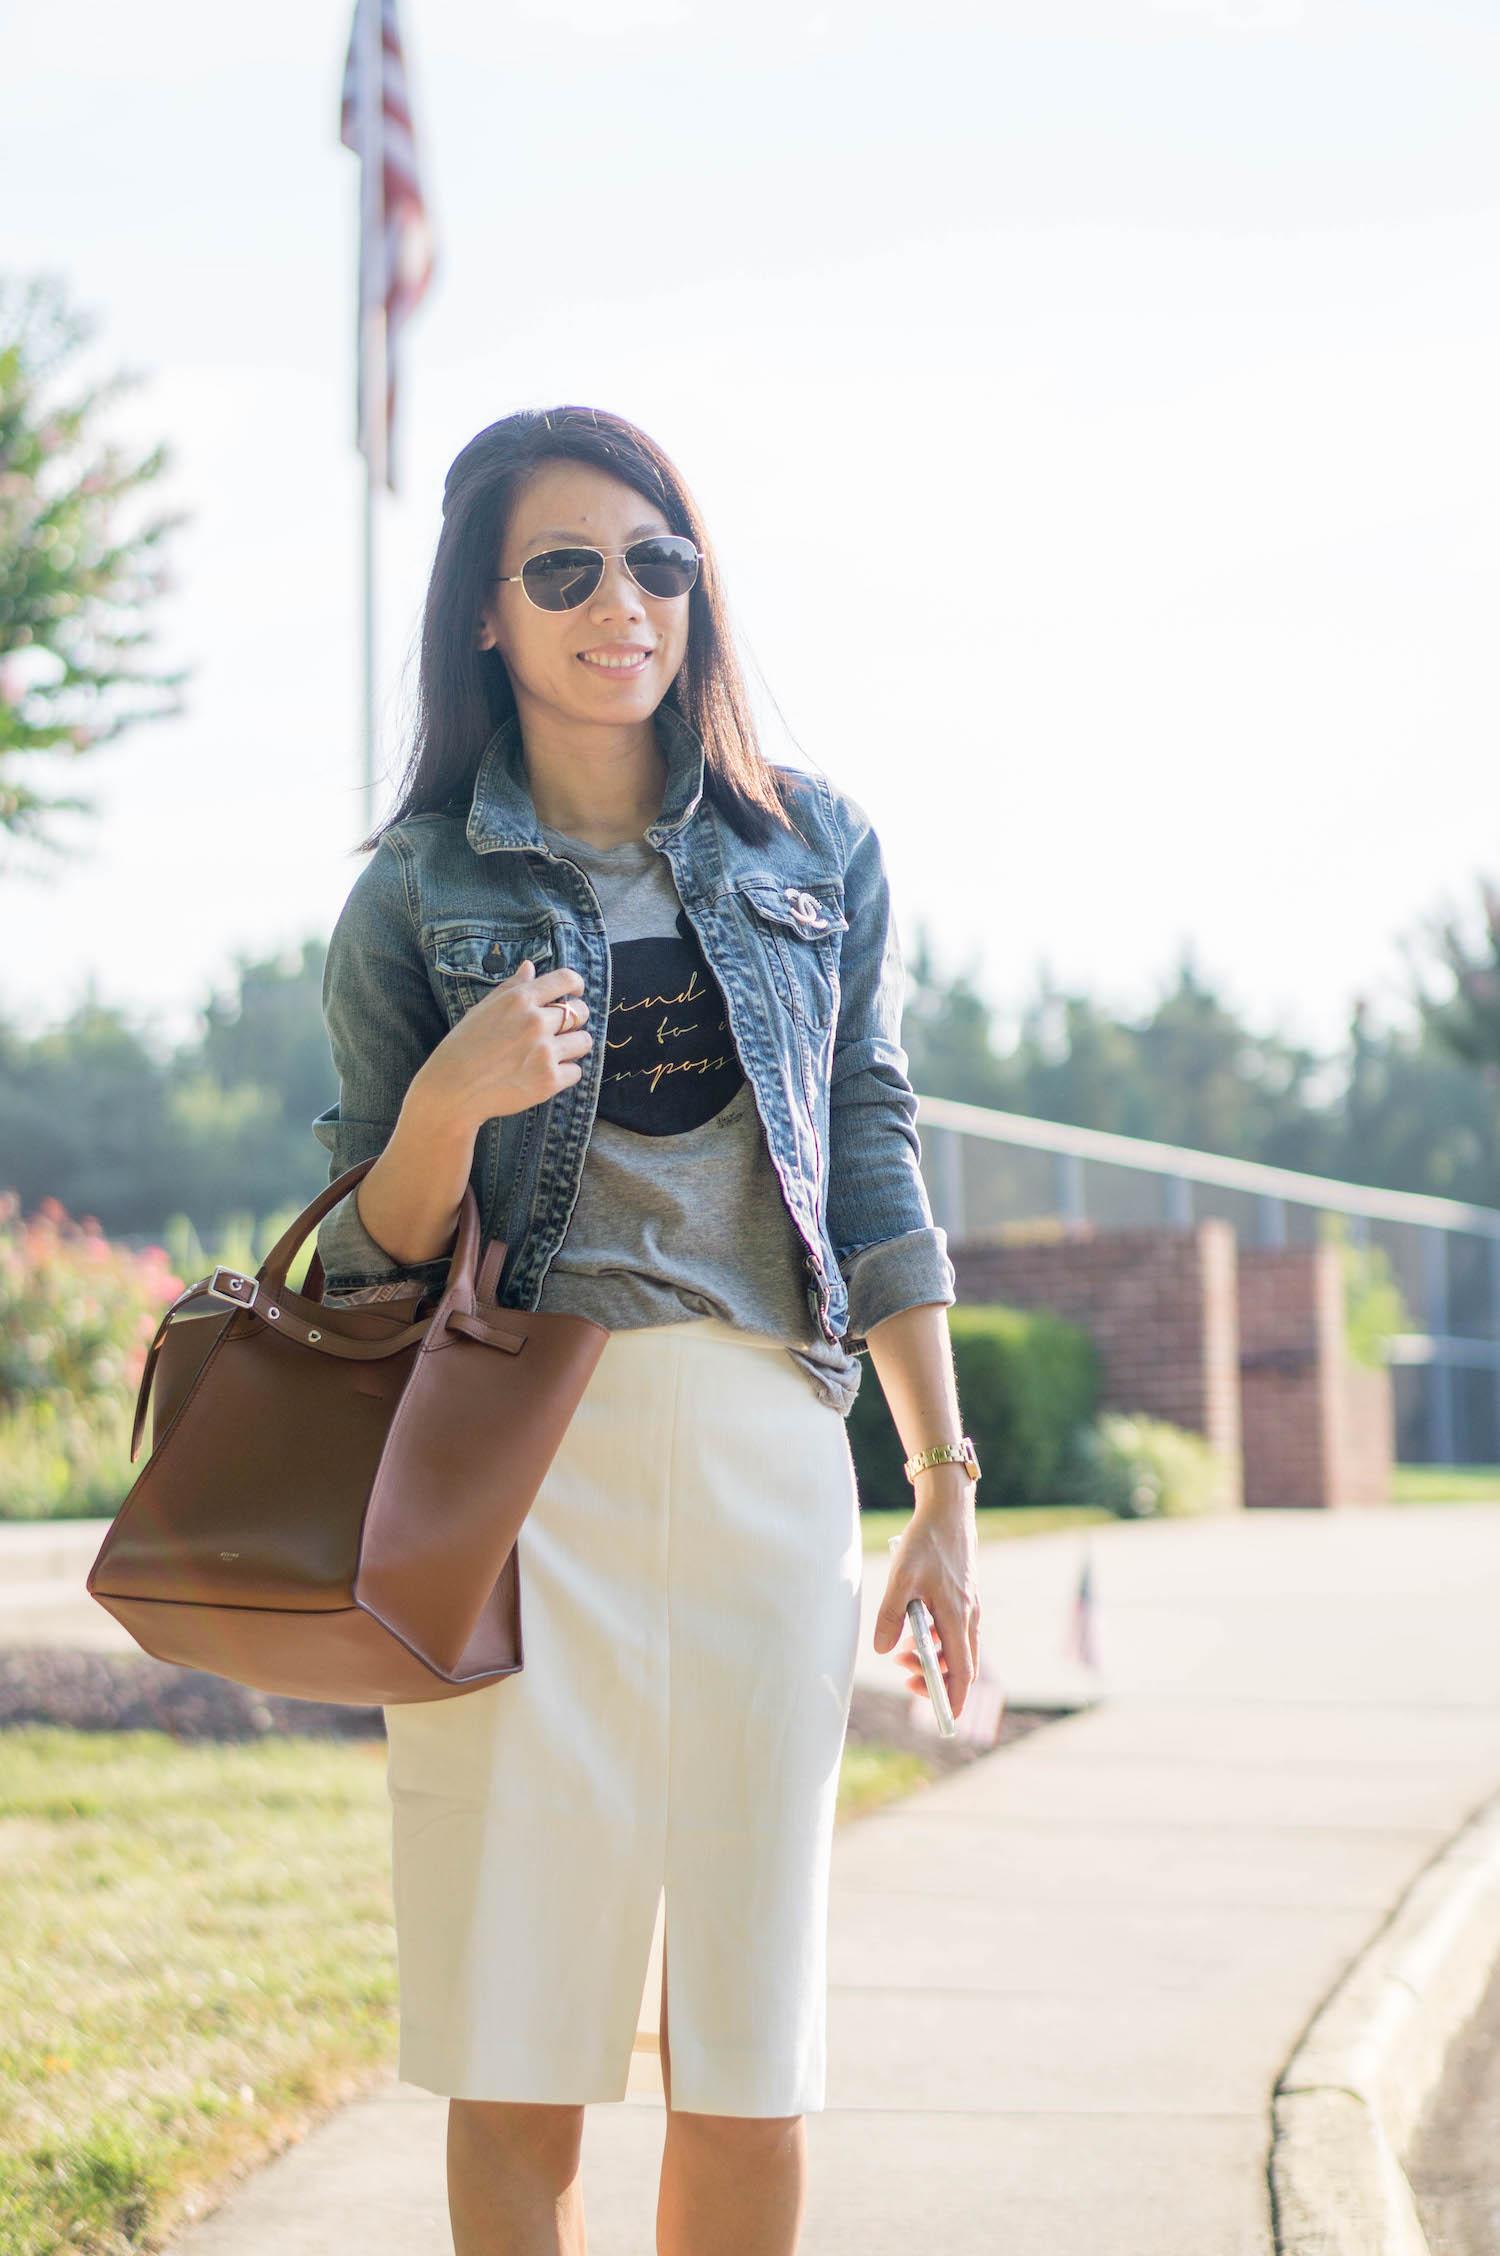 Chanel 18P crystal/pearl brooch, denim jacket, Celine small big bag, Ann Taylor front slit pencil skirt, Olivia Burton gold watch